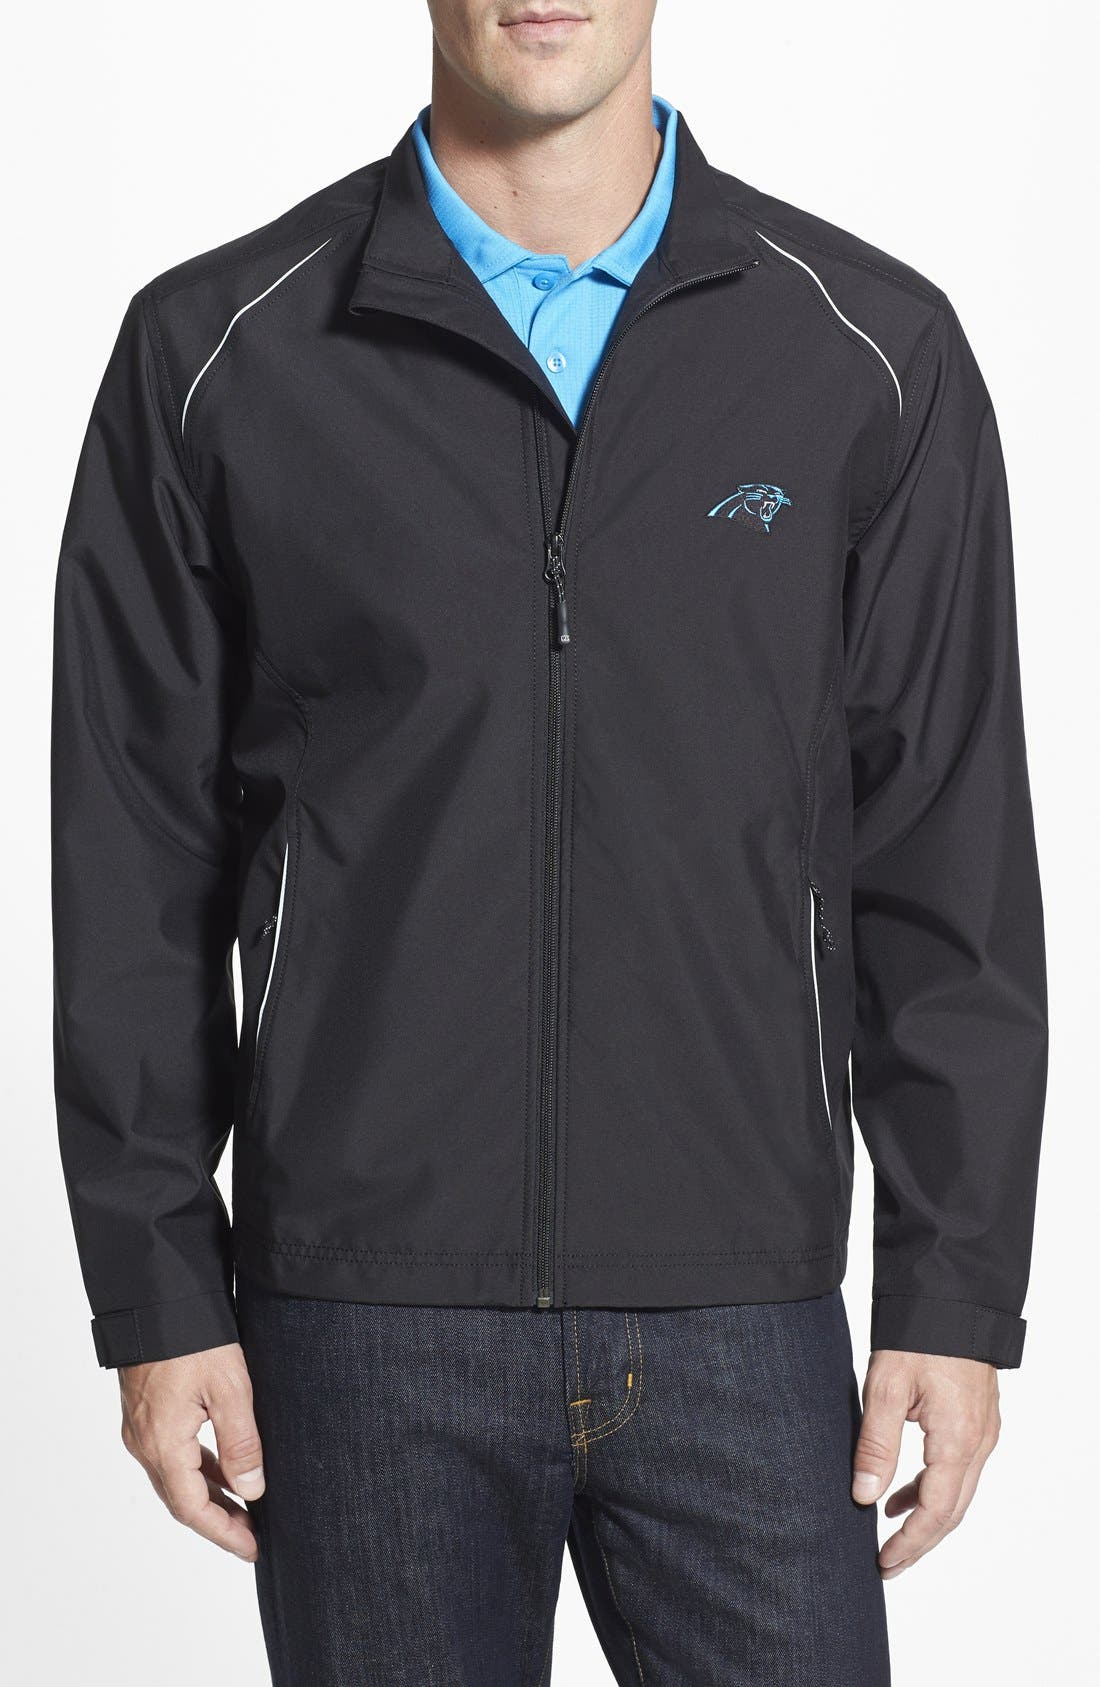 Main Image - Cutter & Buck Carolina Panthers - Beacon WeatherTec Wind & Water Resistant Jacket